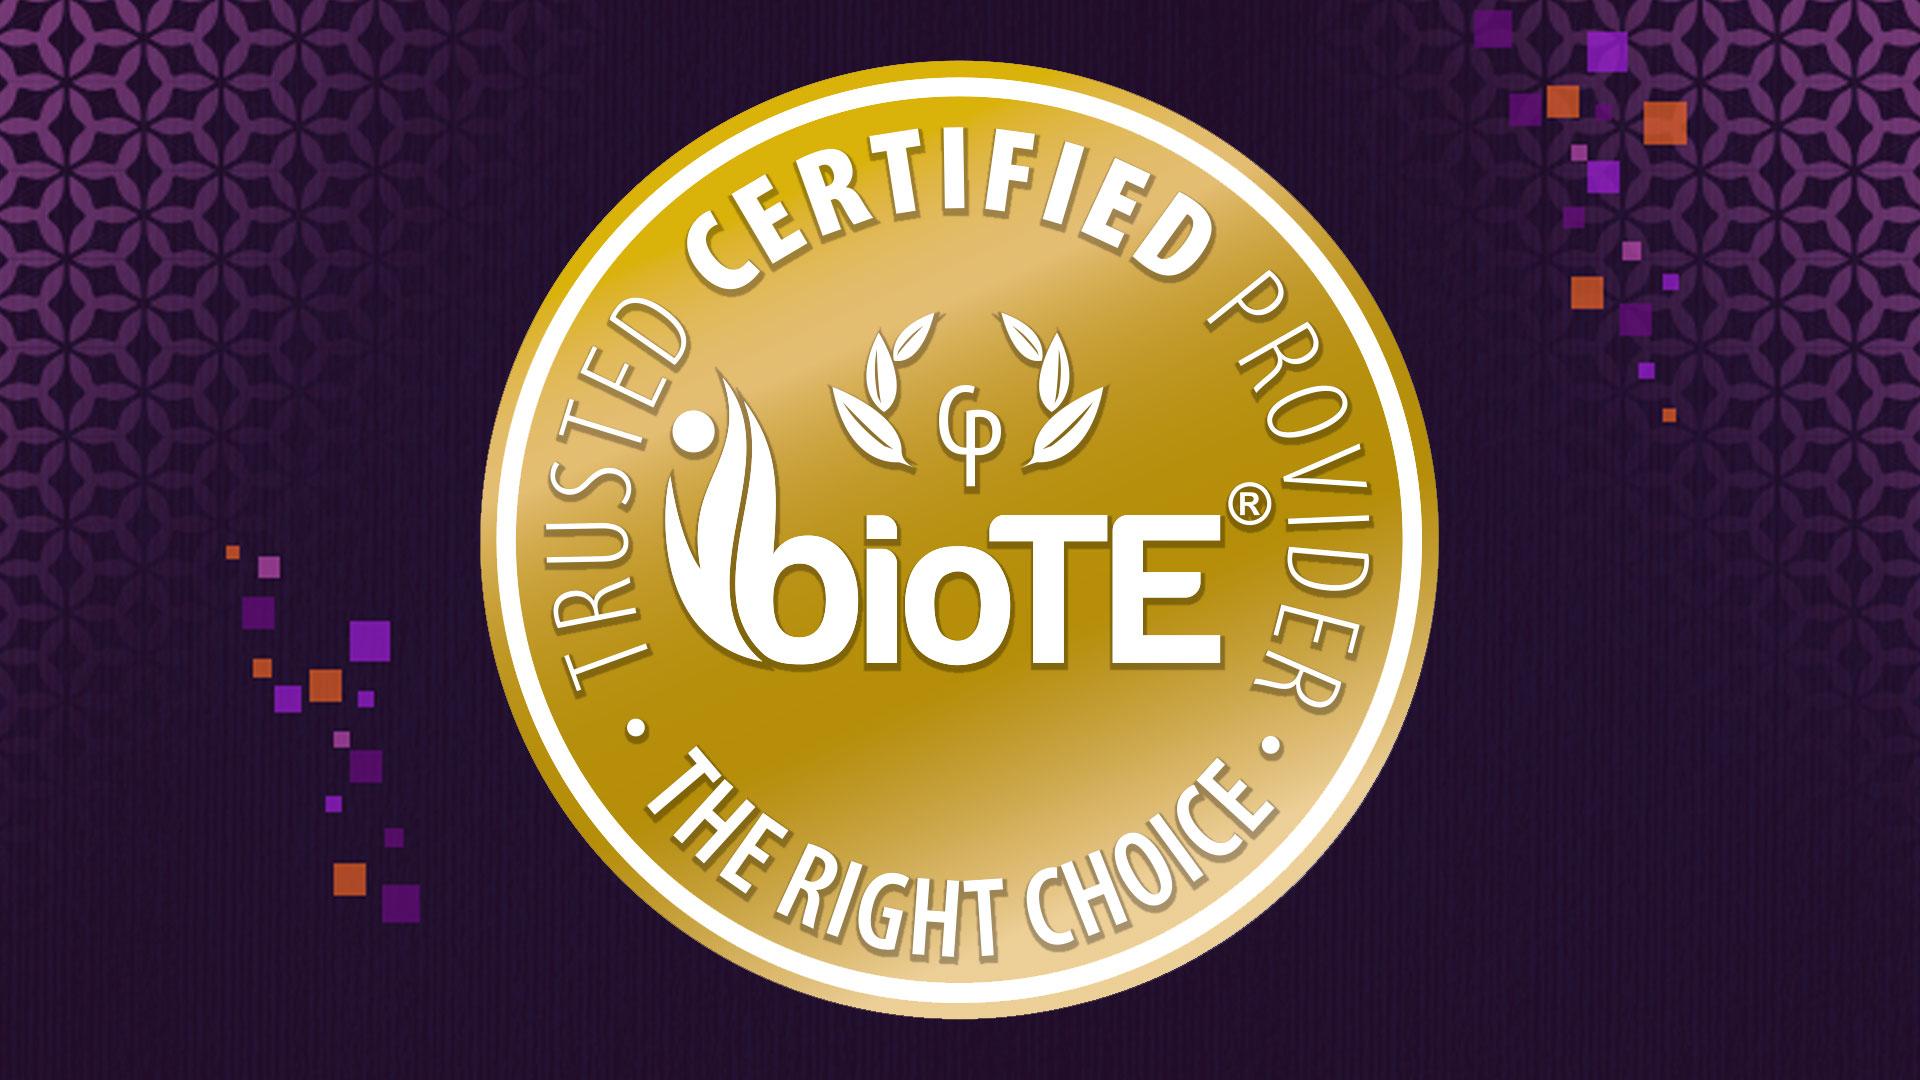 studio-512-biote-medical-4_1522939311991.jpg